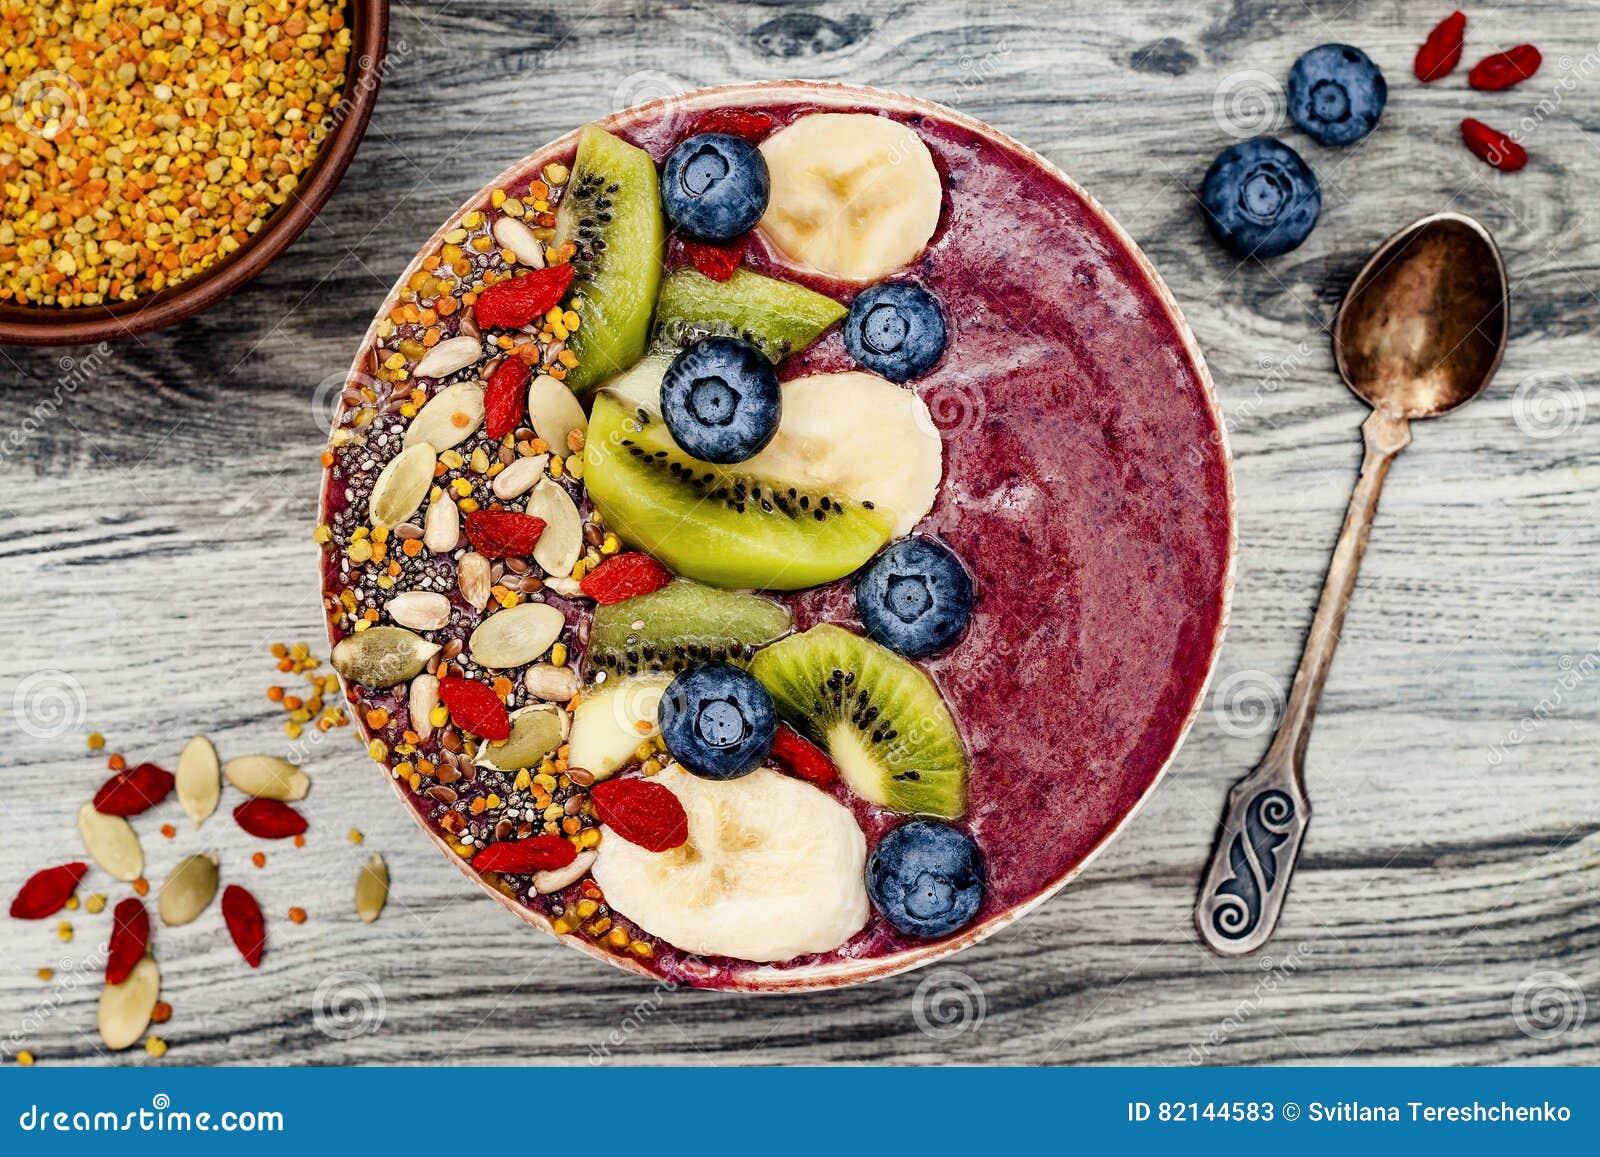 Acai早餐superfoods圆滑的人滚保龄球与chia种子、蜂花粉、goji莓果顶部和果子 顶上 顶视图,平的位置